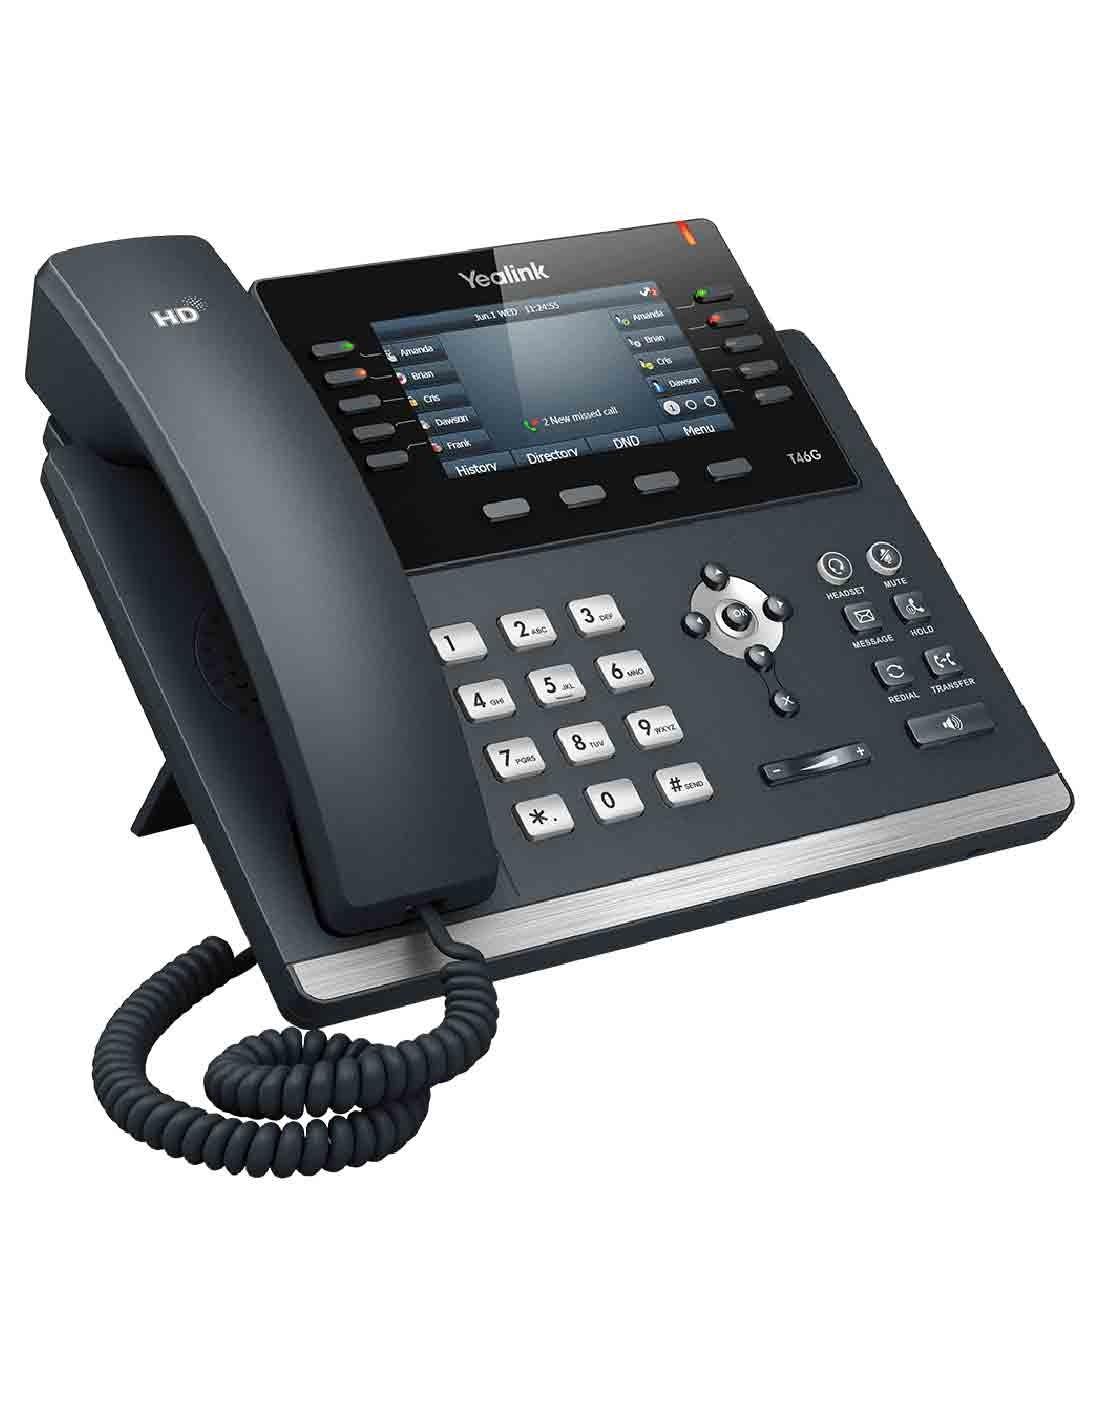 Yealink SIP-T46S IP Phone Images